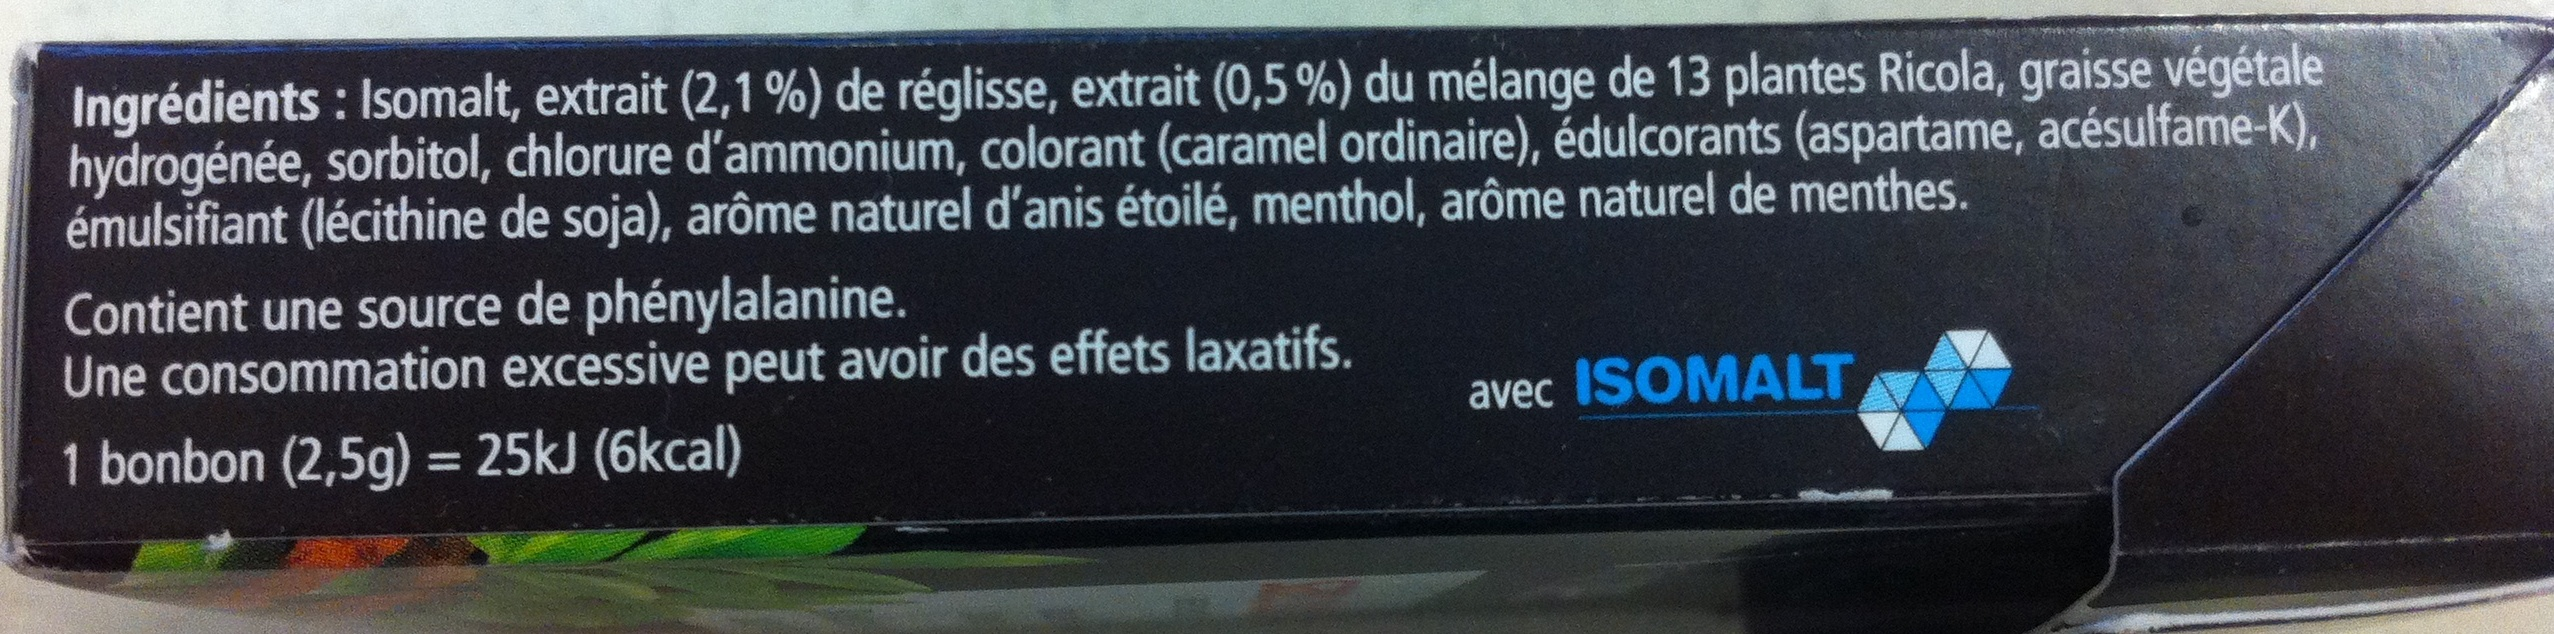 Ricola Réglisse sans sucres - Ingrediënten - fr